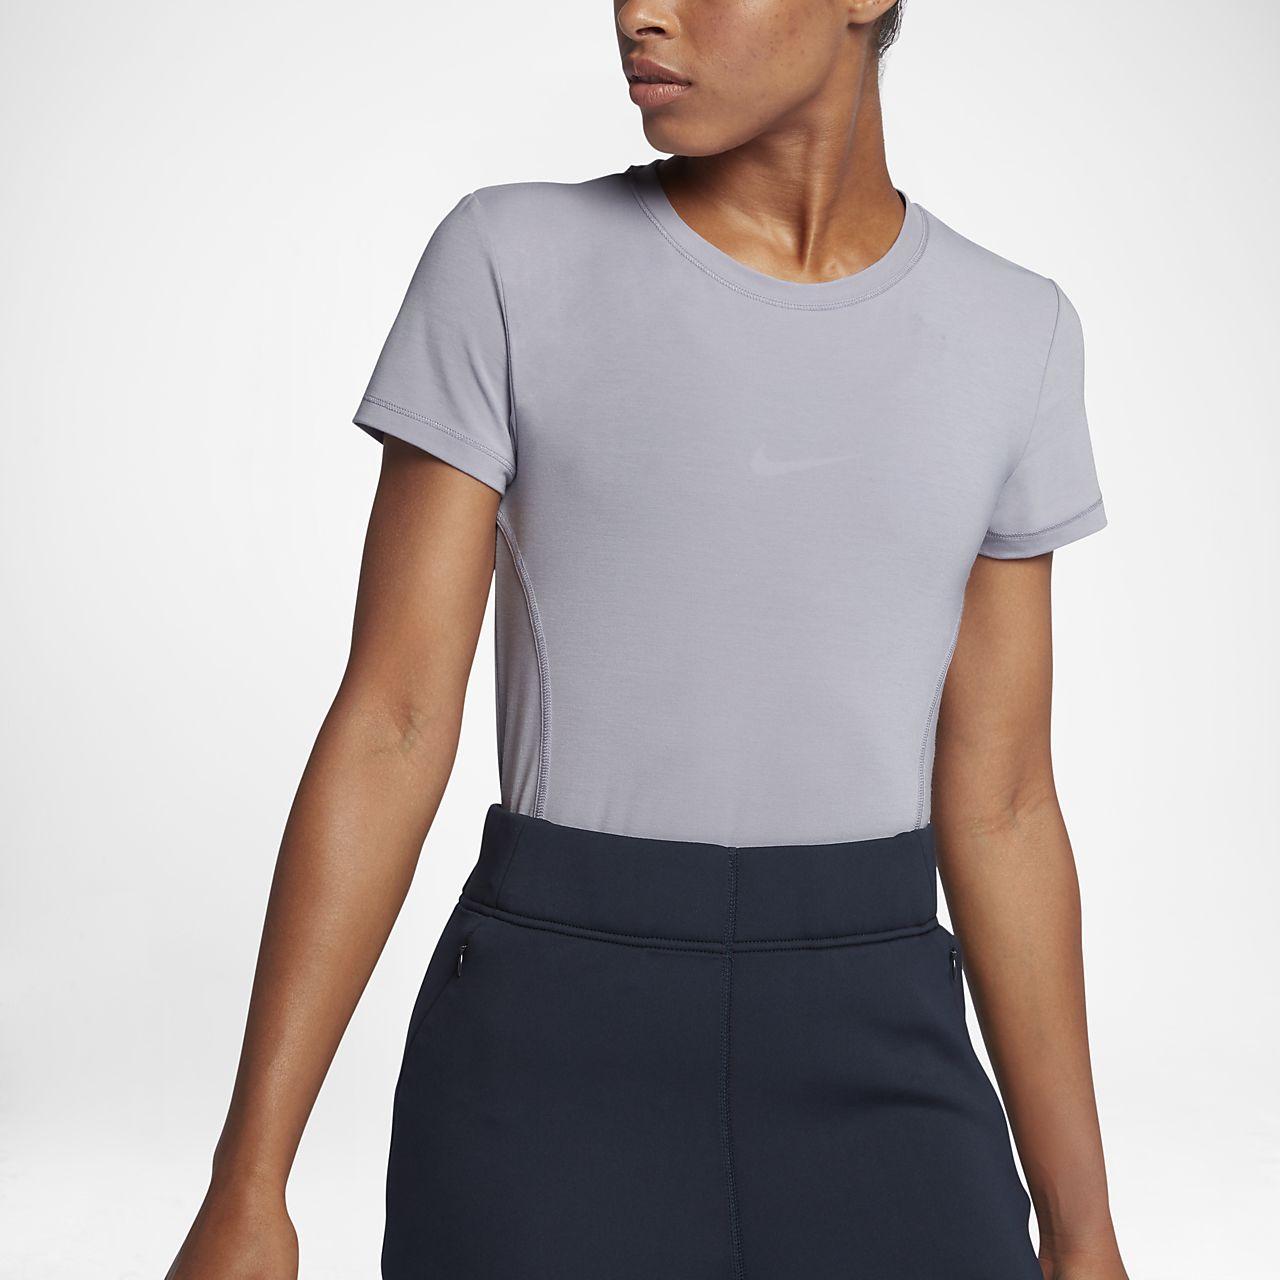 Low Resolution Nike Women's Training Bodysuit Nike Women's Training Bodysuit